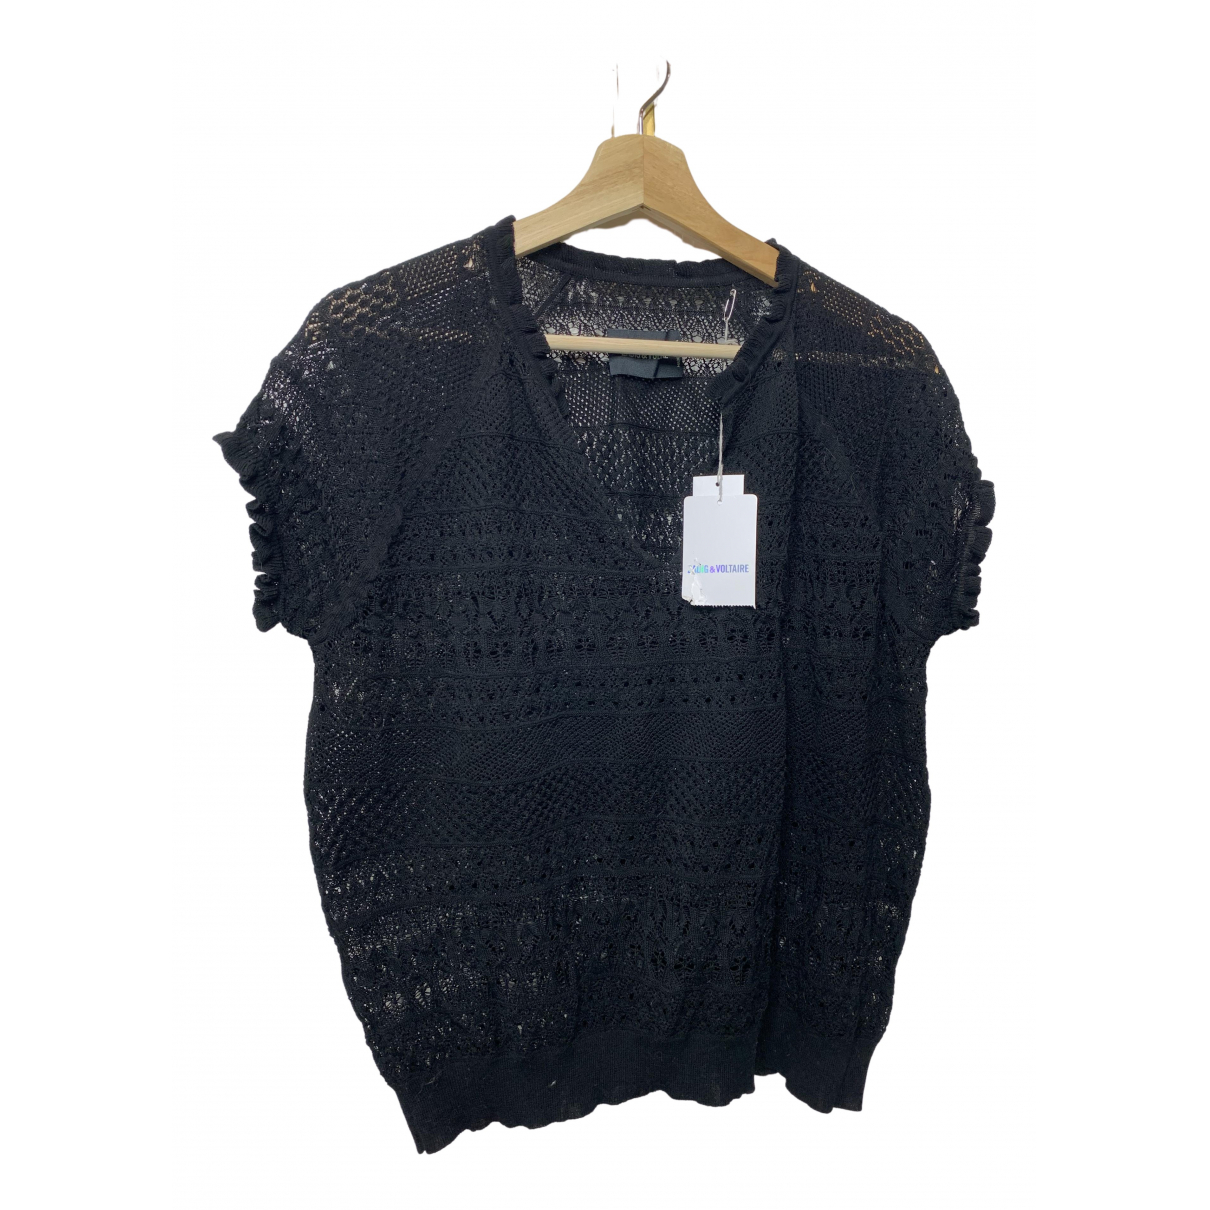 Zadig & Voltaire \N Black Cotton  top for Women M International